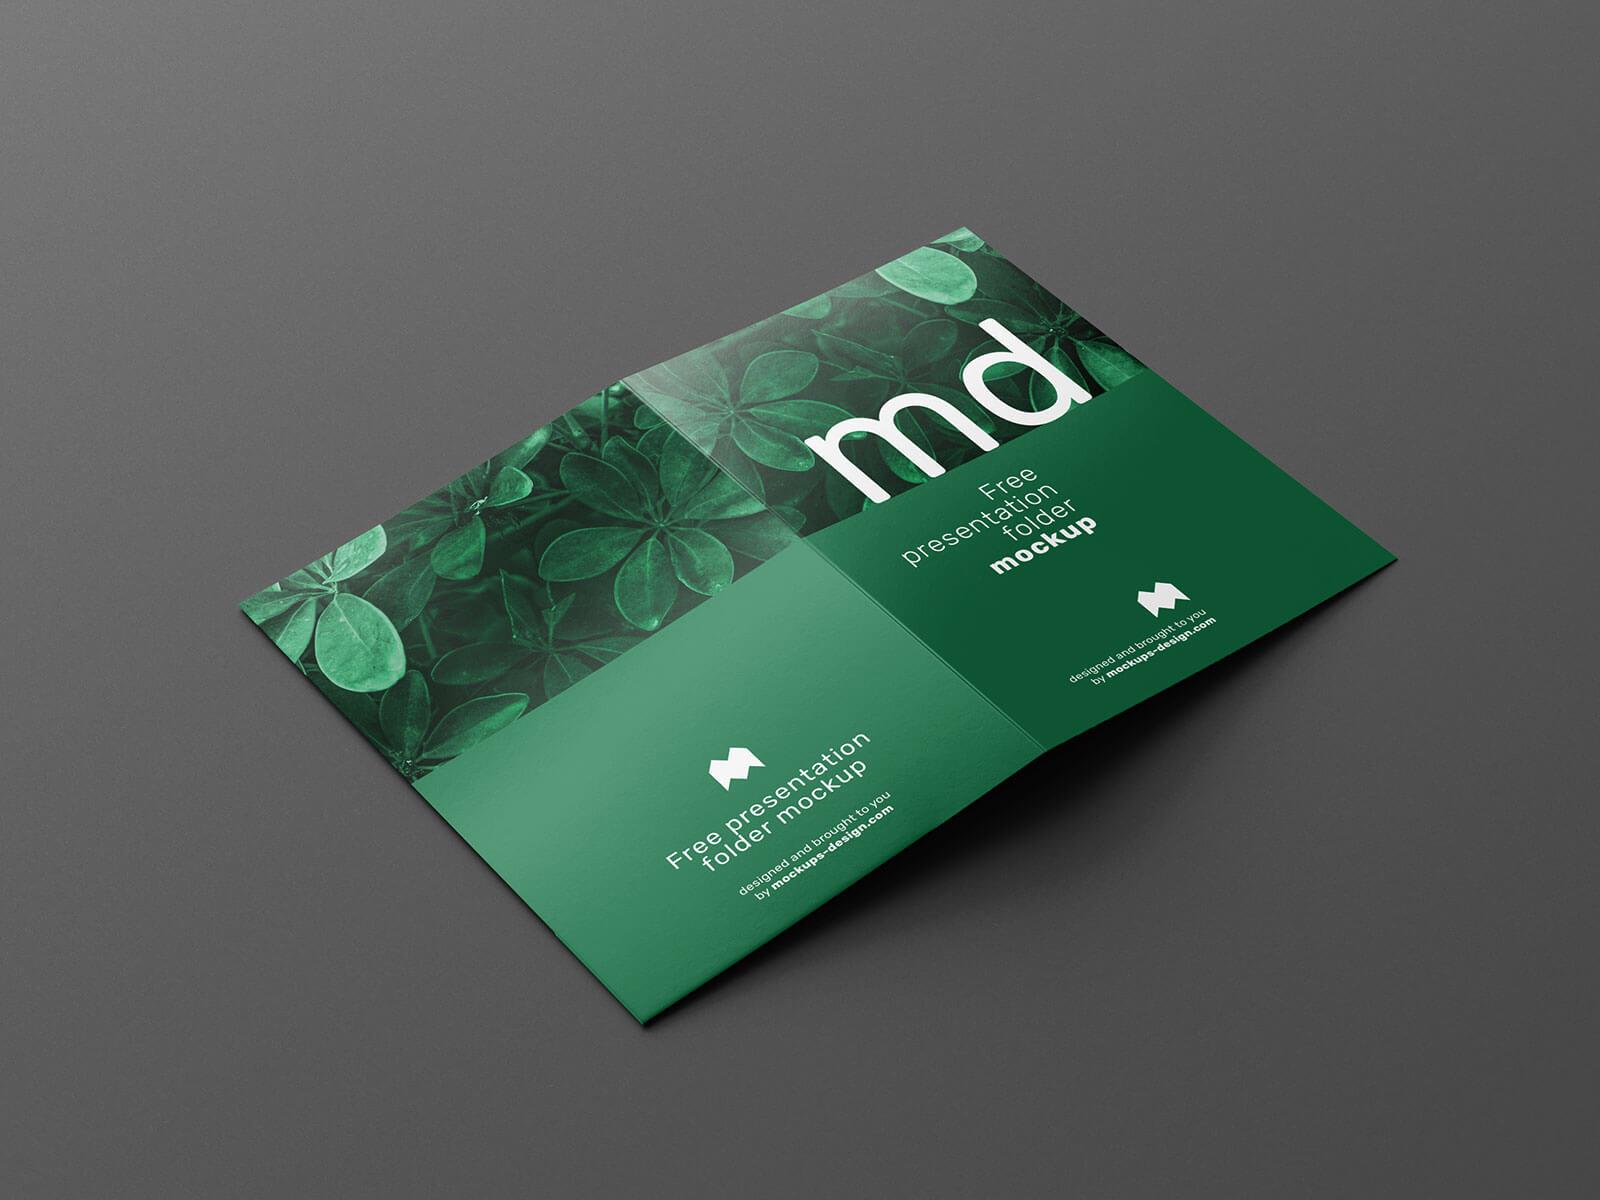 Use this free presentation folder mockup to showcase your beautiful designs swiftly. Free Corporate Presentation Folder Mockup Psd Set Good Mockups